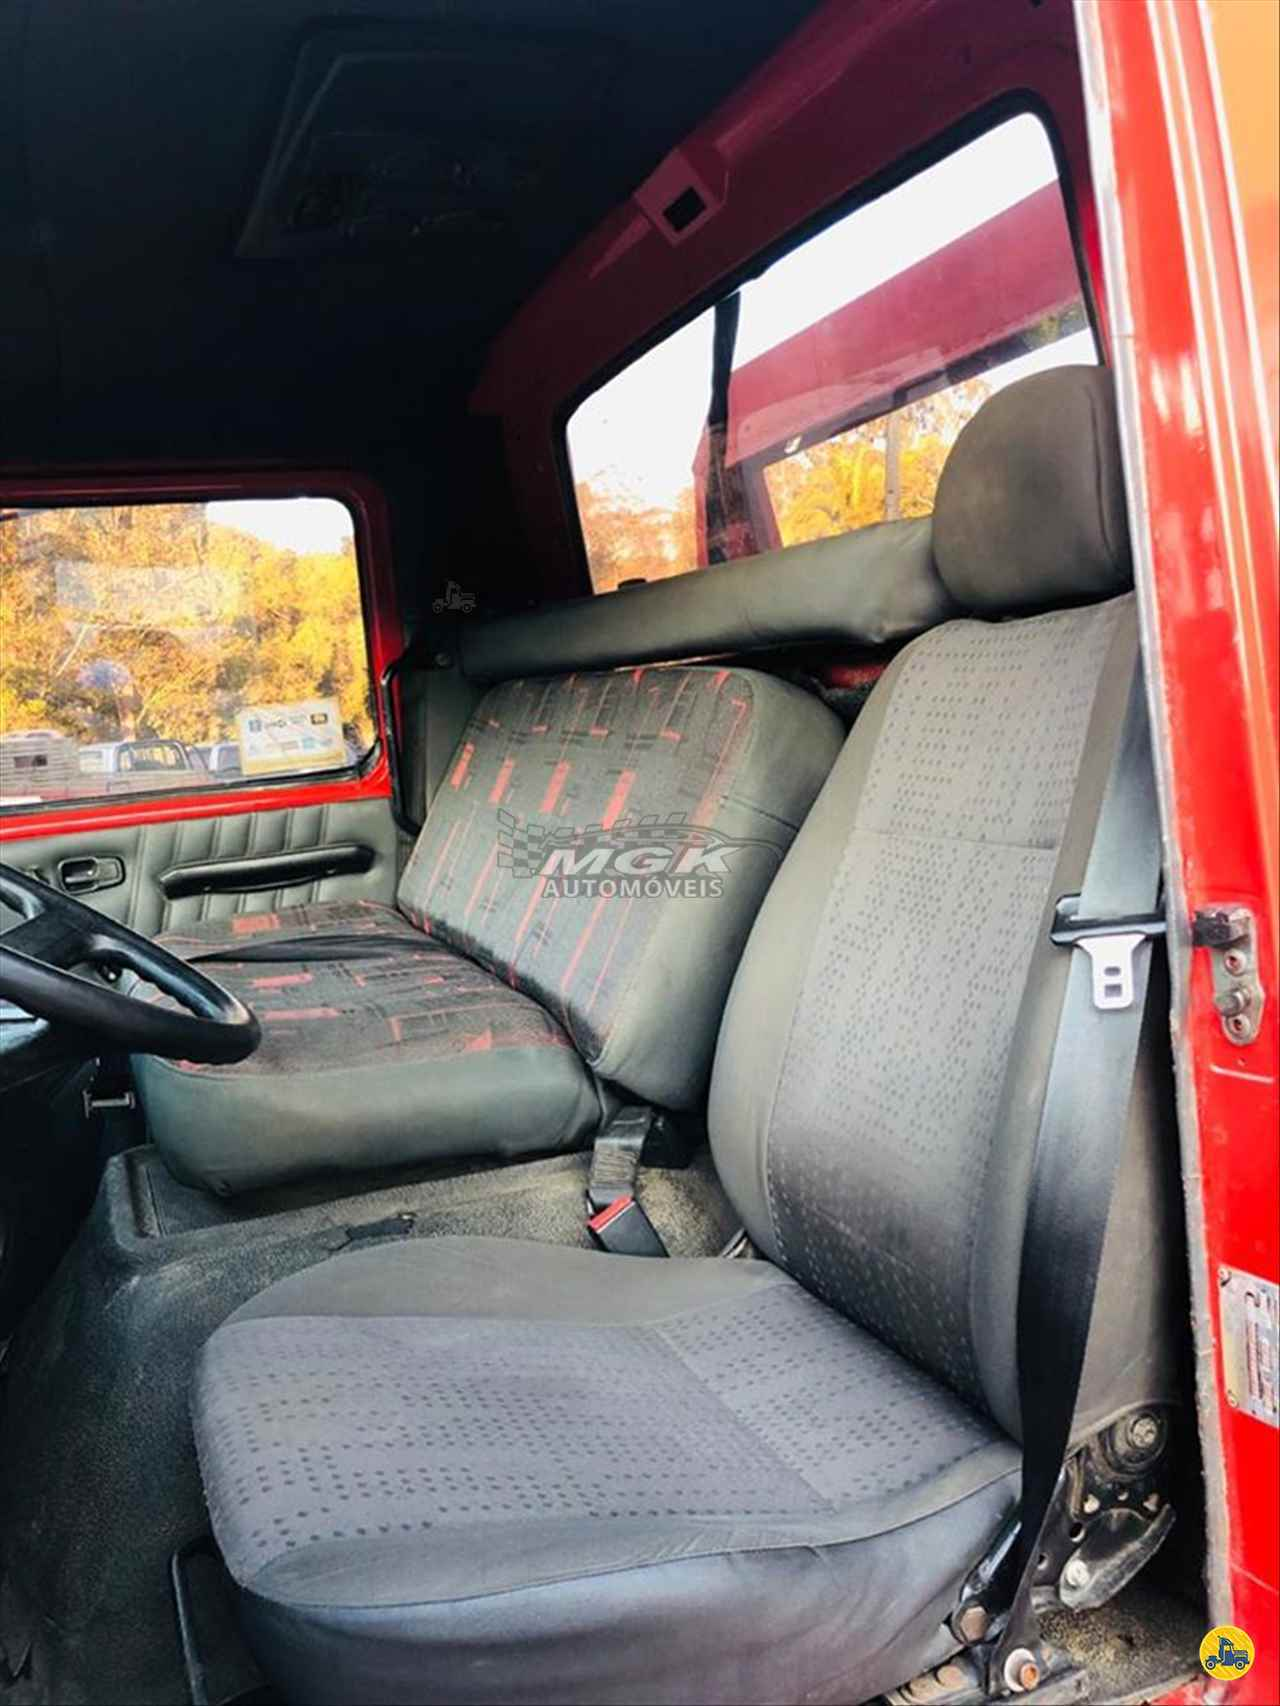 VOLKSWAGEN VW 790 000km 1988/1988 MGK Automóveis